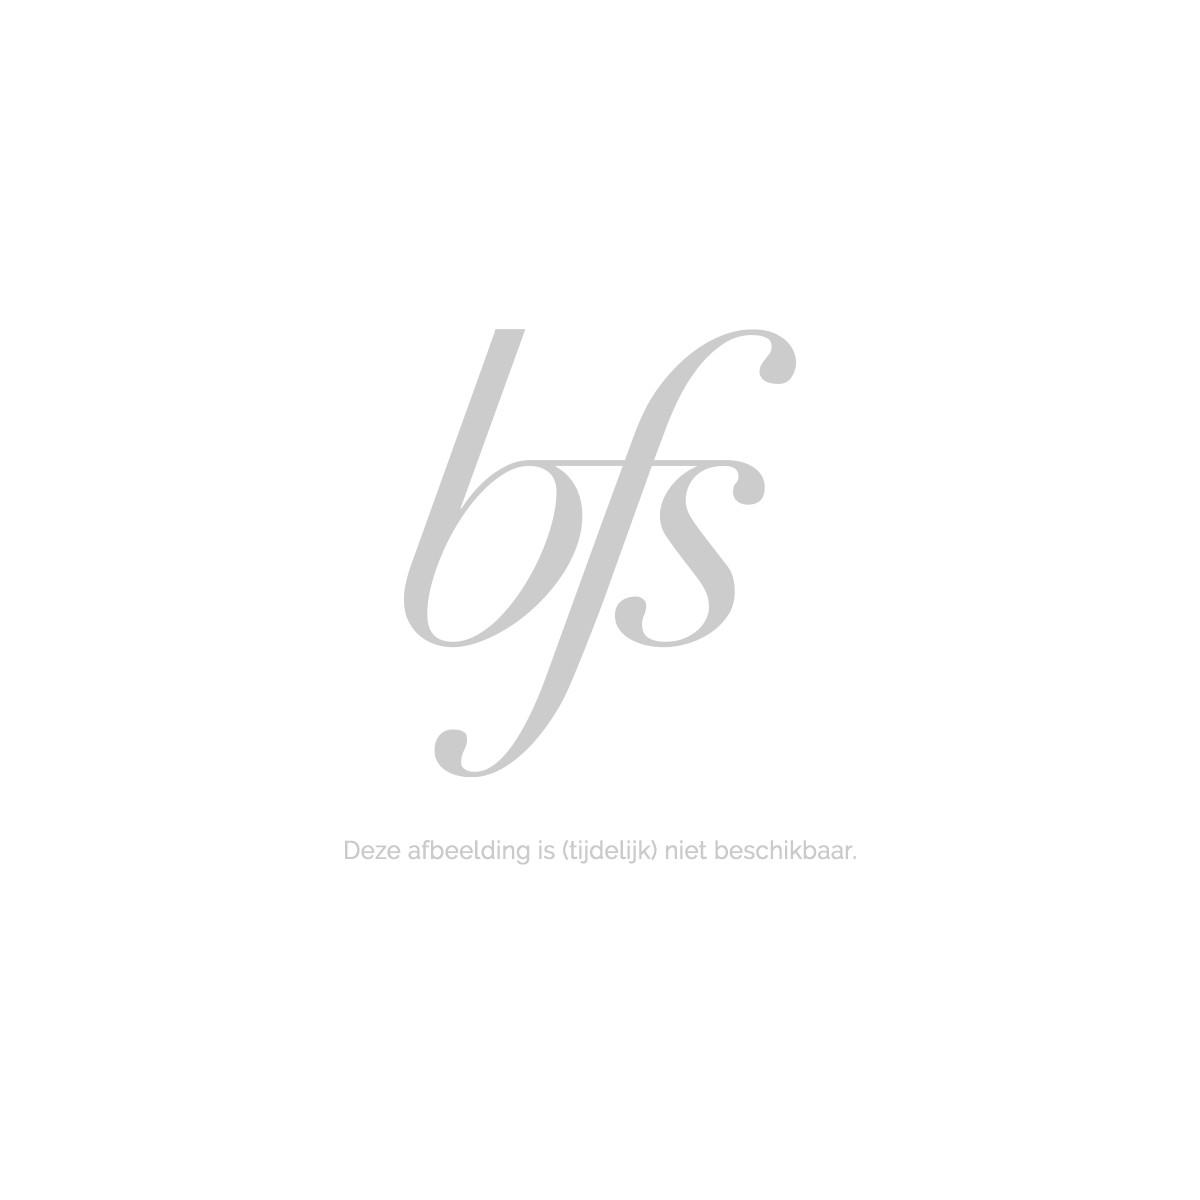 Vandini Vitality Body Butter Vanilla Blossom and Macadamia Oil 200 Ml